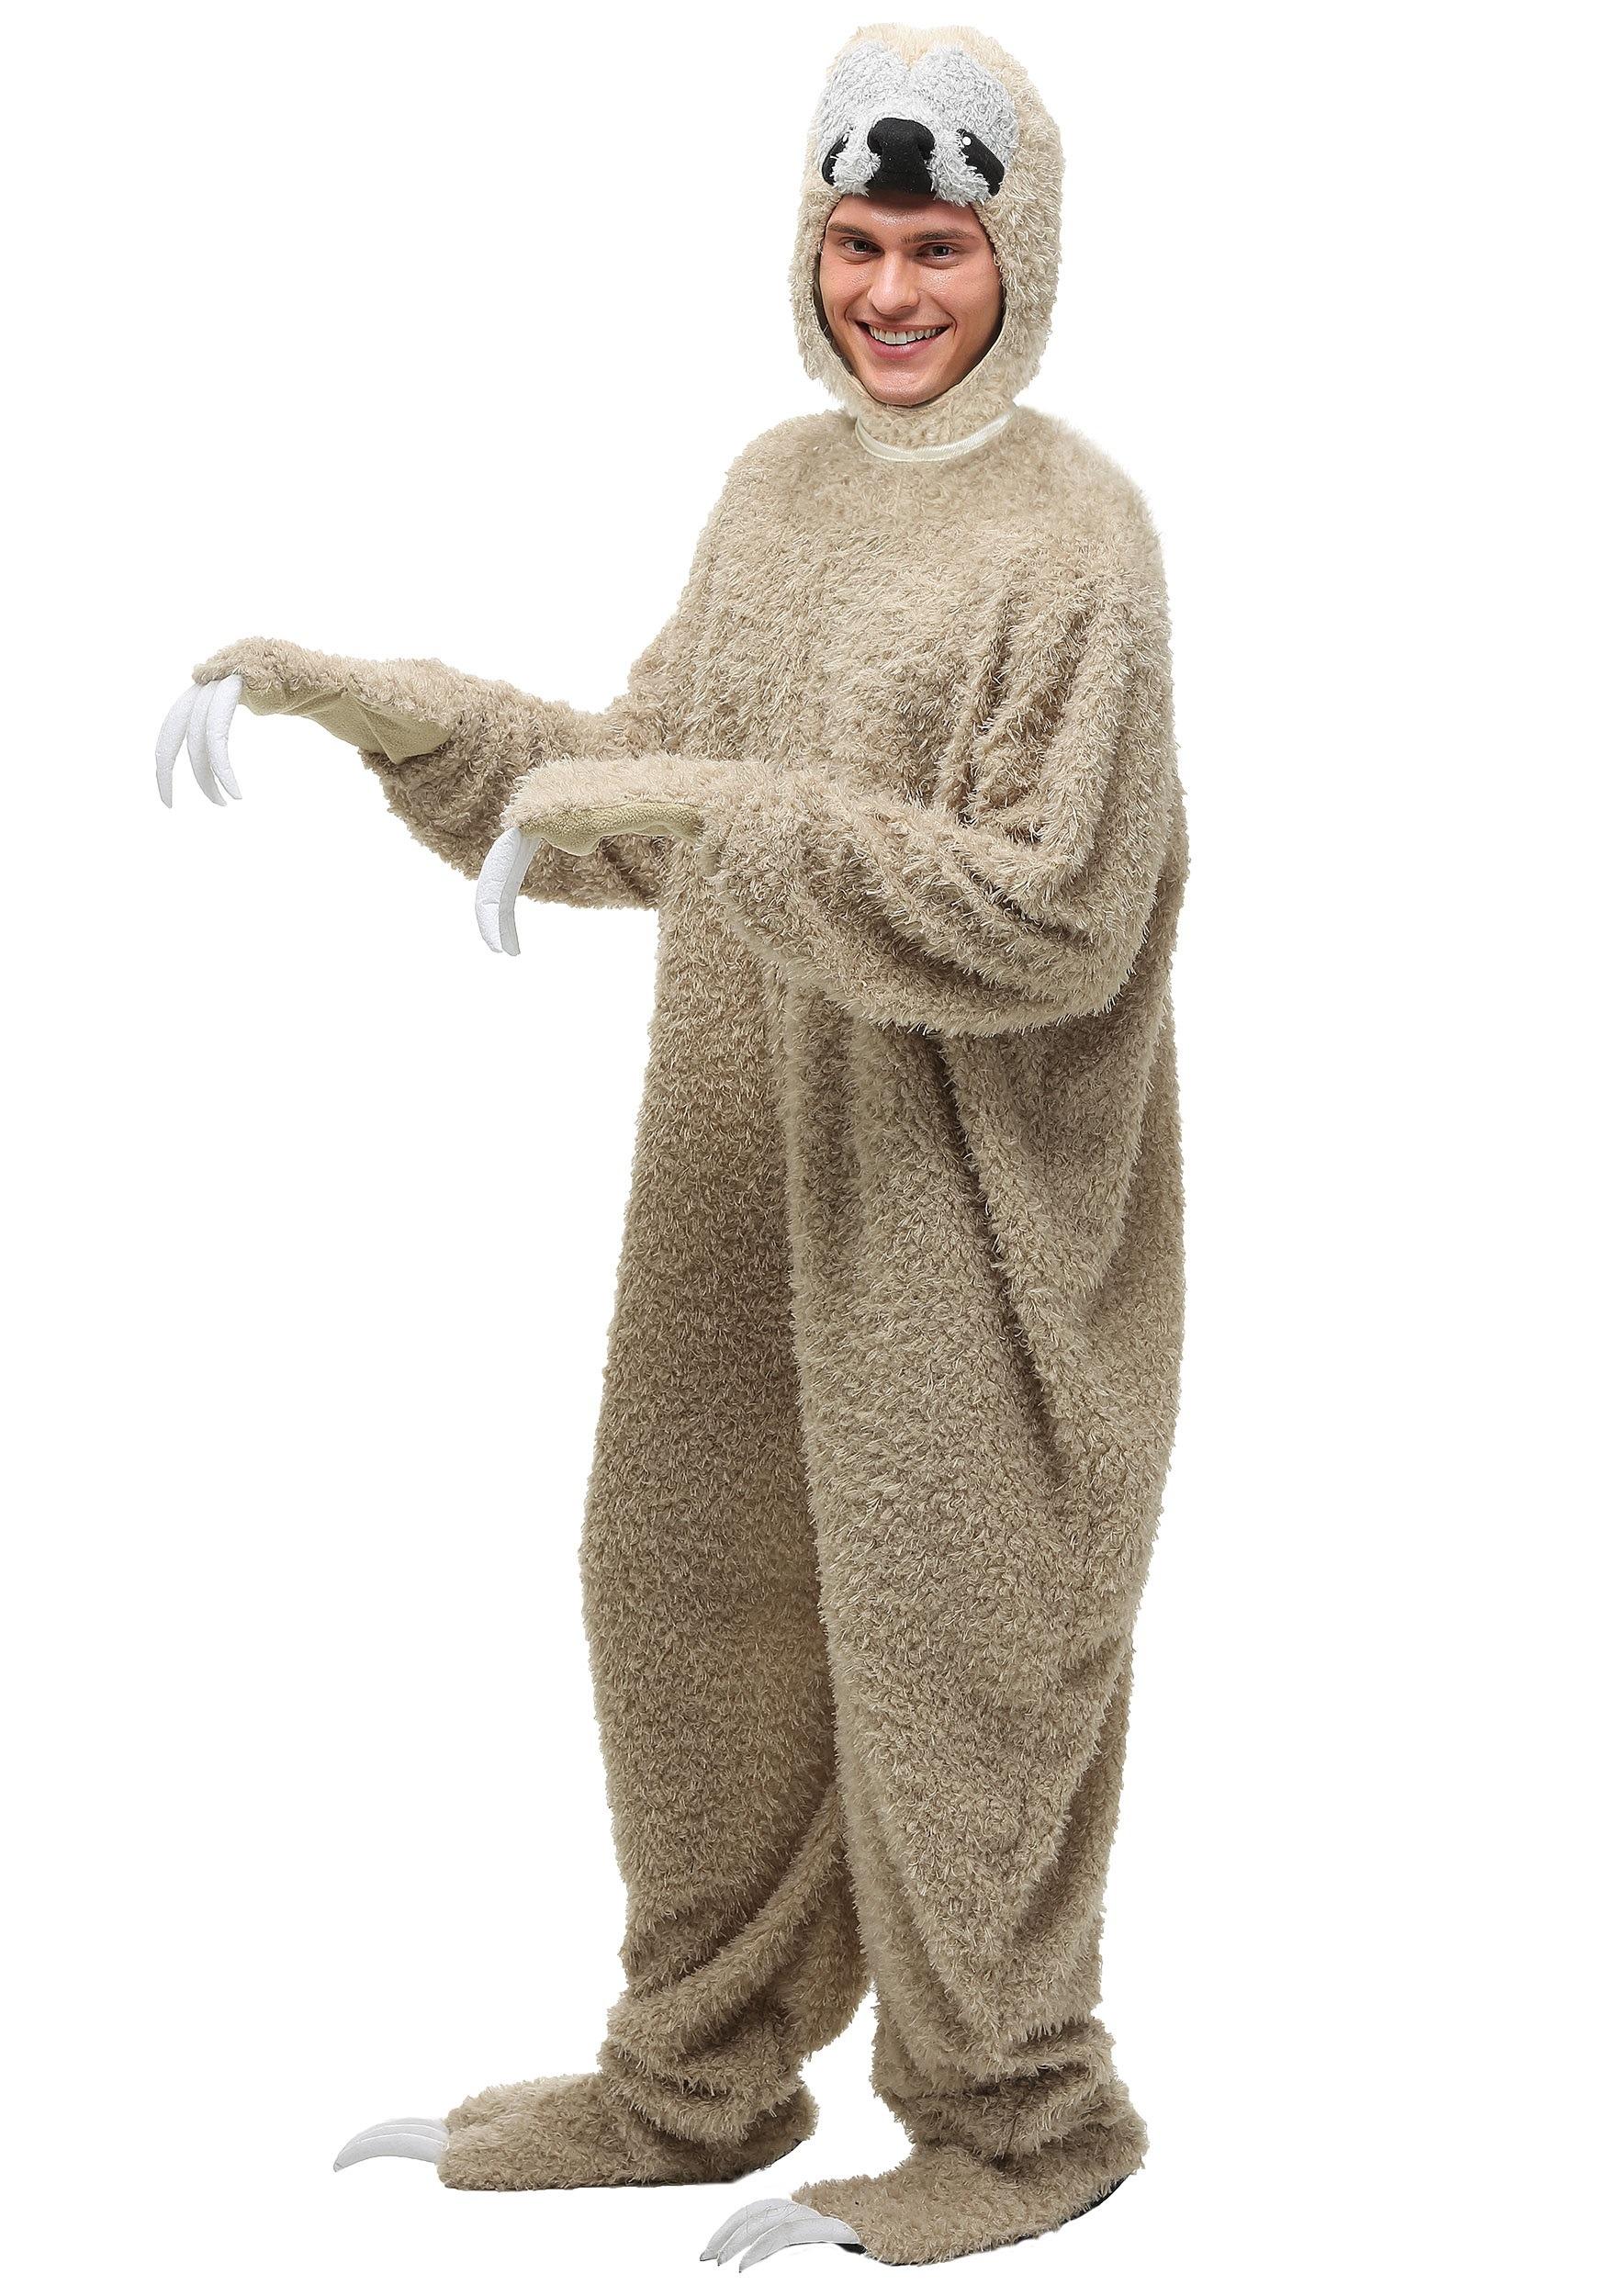 Wwe Halloween Costume